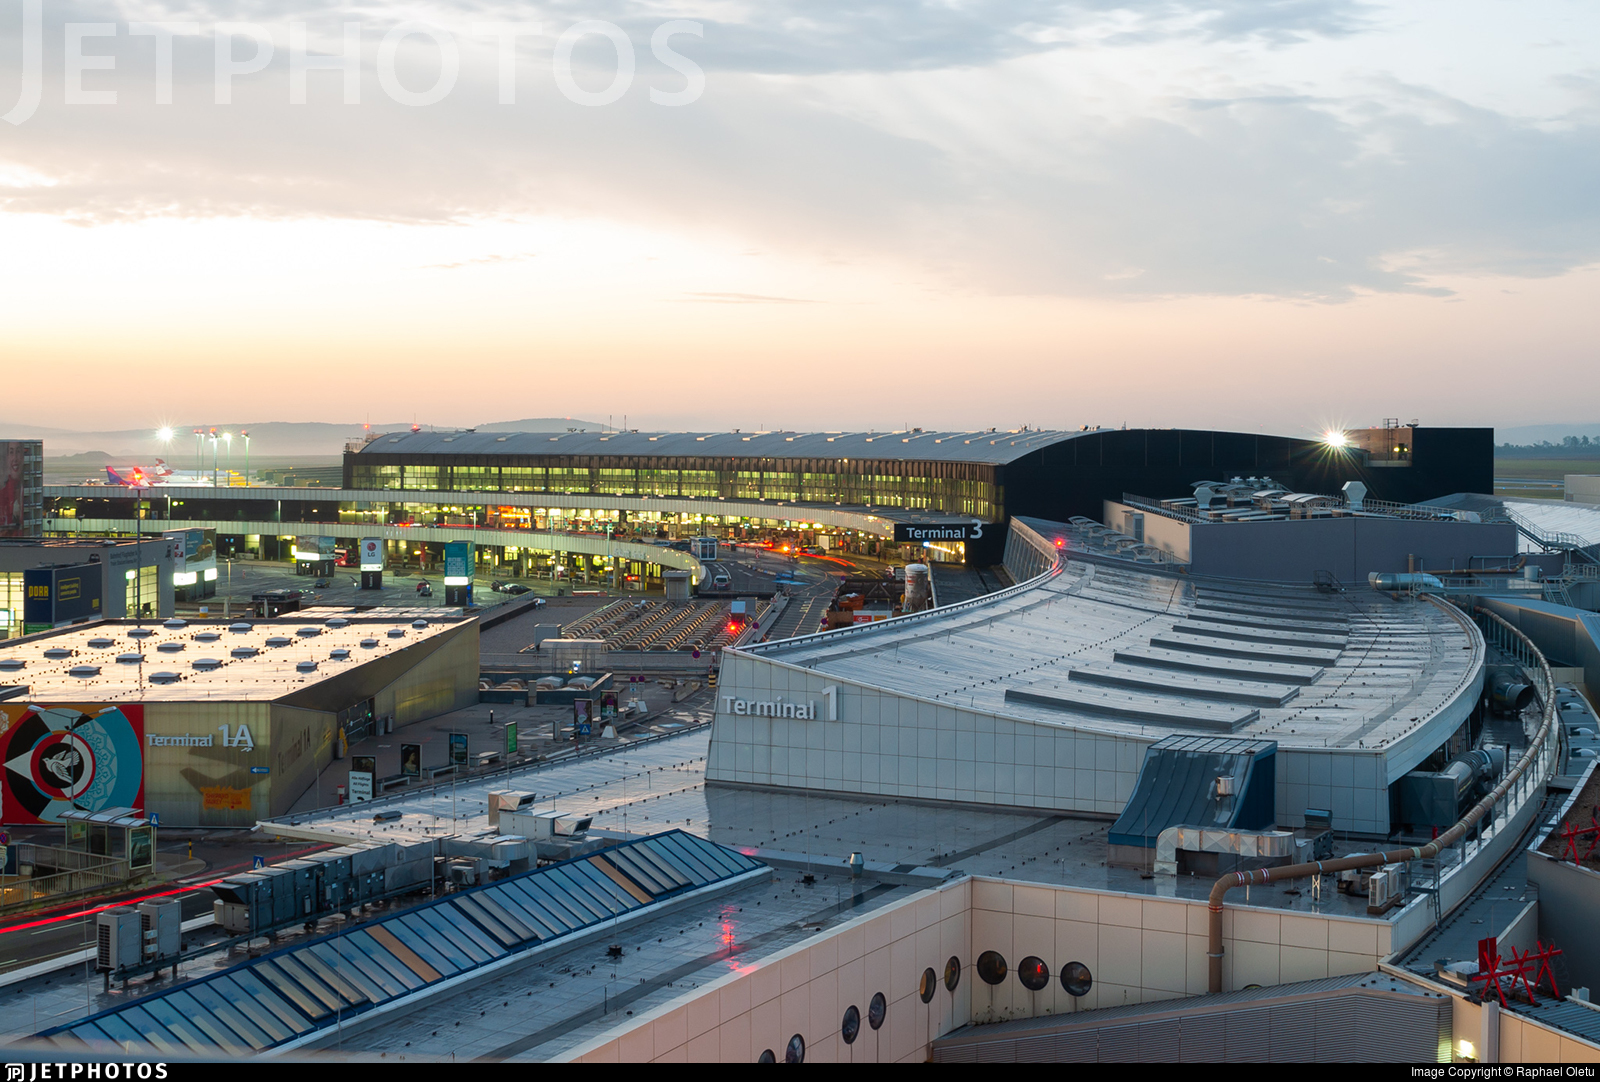 LOWW - Airport - Terminal